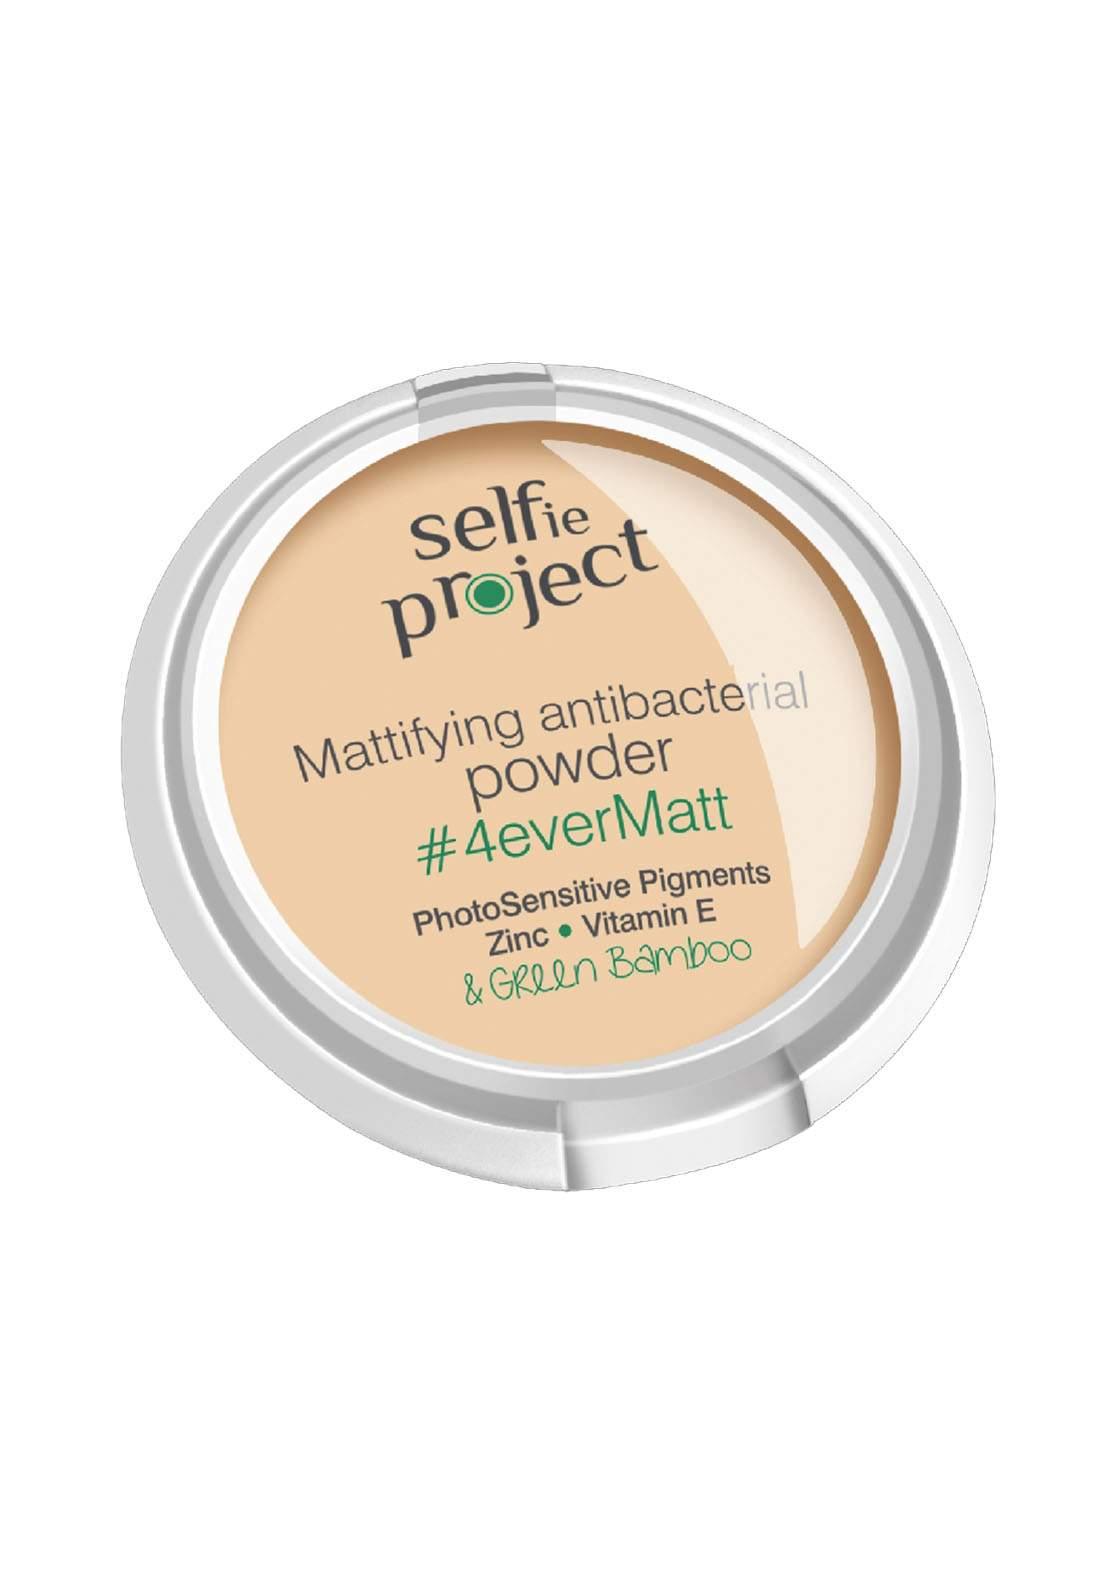 Selfie Project Mattifying Antibacterial Powder باودر مضاد للبكتريا